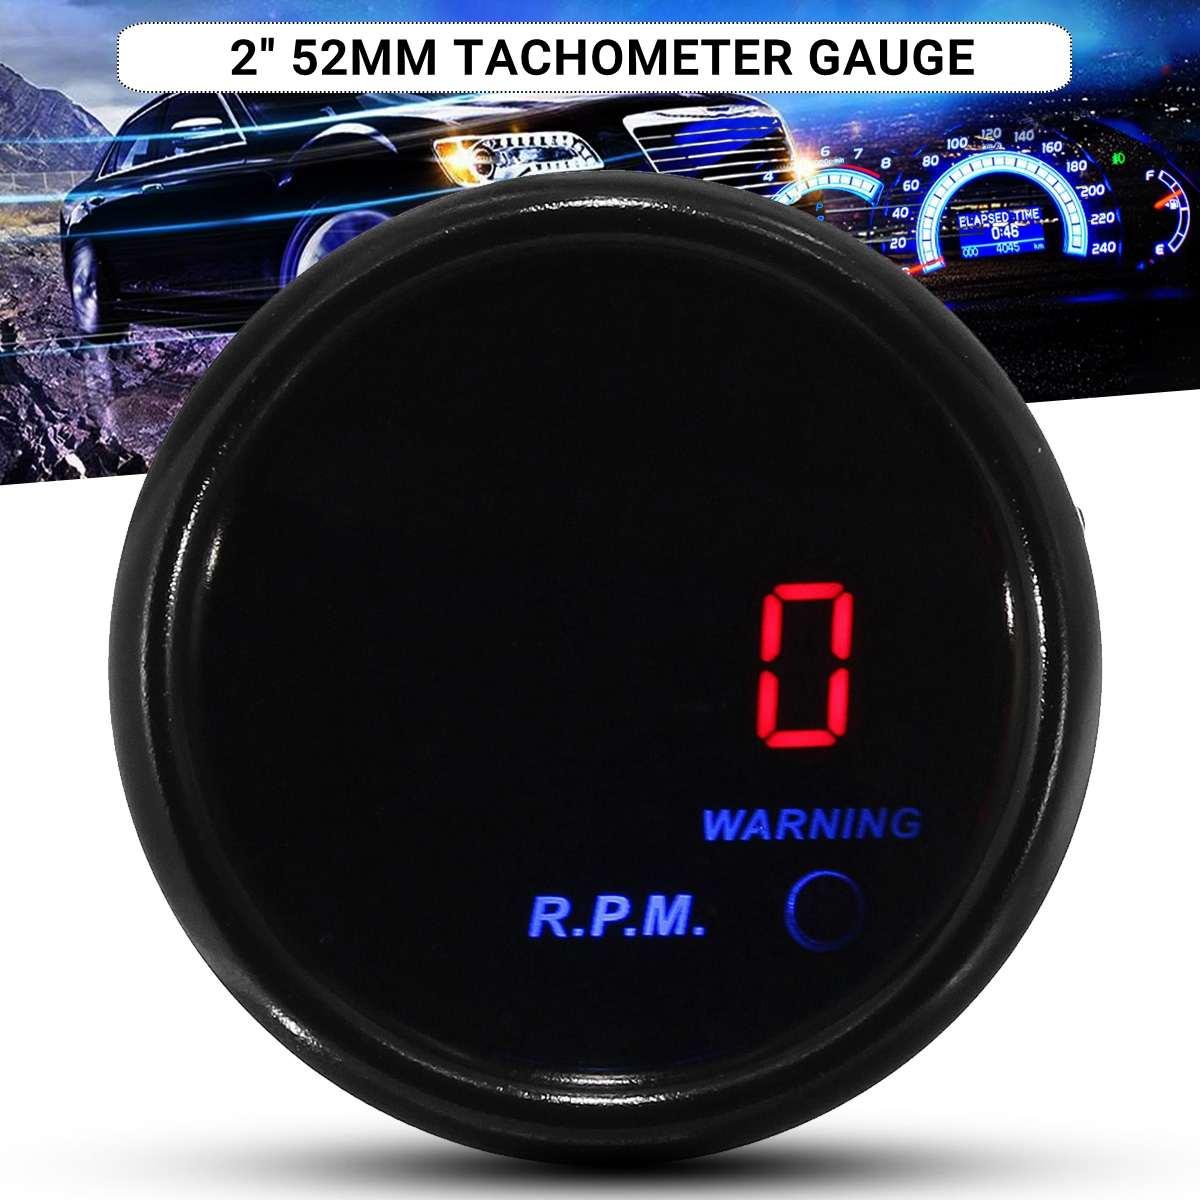 2 Inch 52mm Car Tachometer 0-9000 RPM Tacho Gauge Digital Red + Blue LED Display Black Face 12V Auto Universal Meter